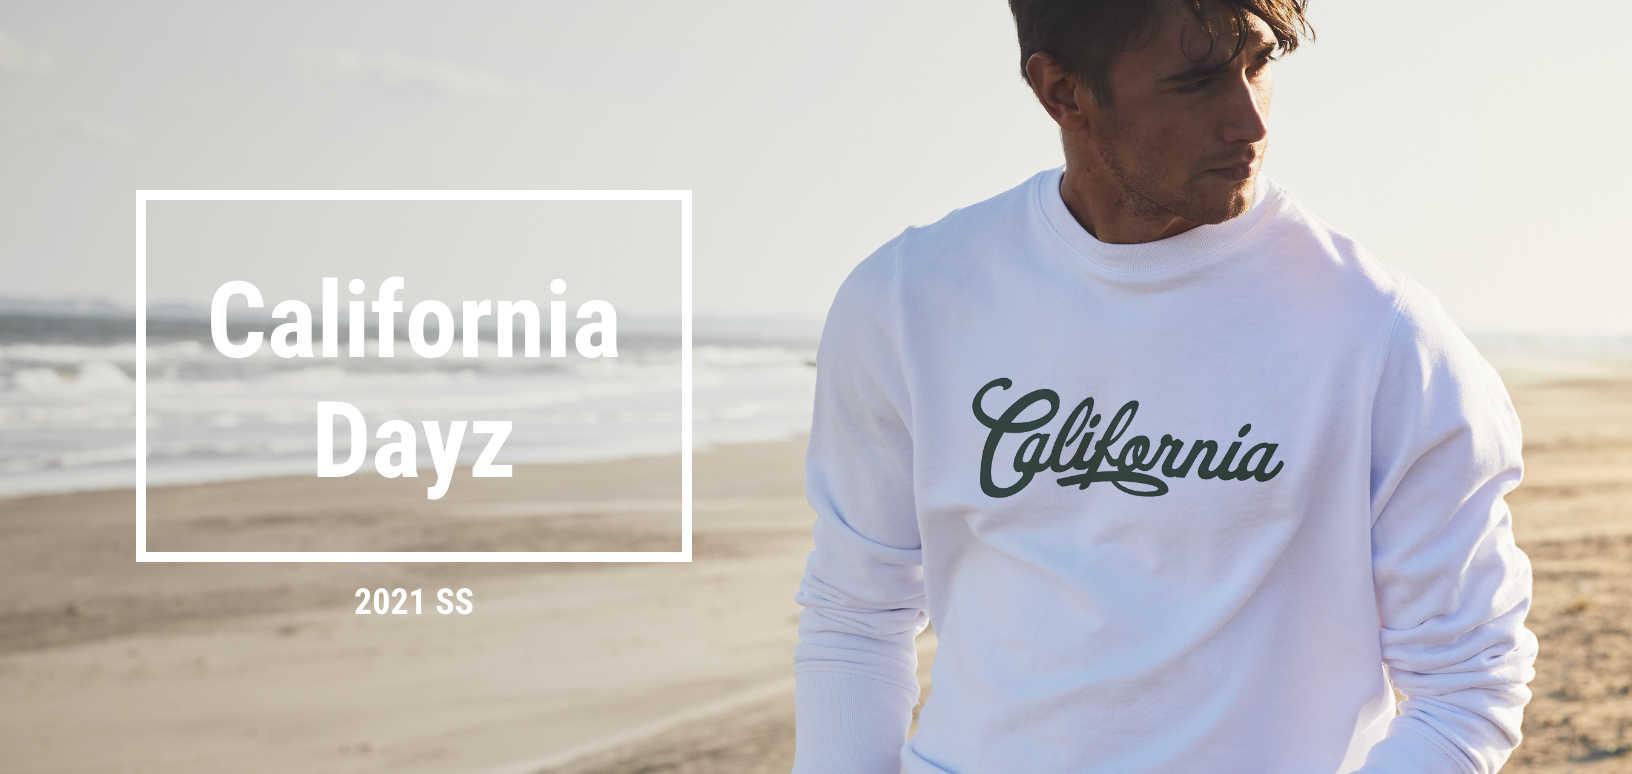 California Dayz 2021 SS